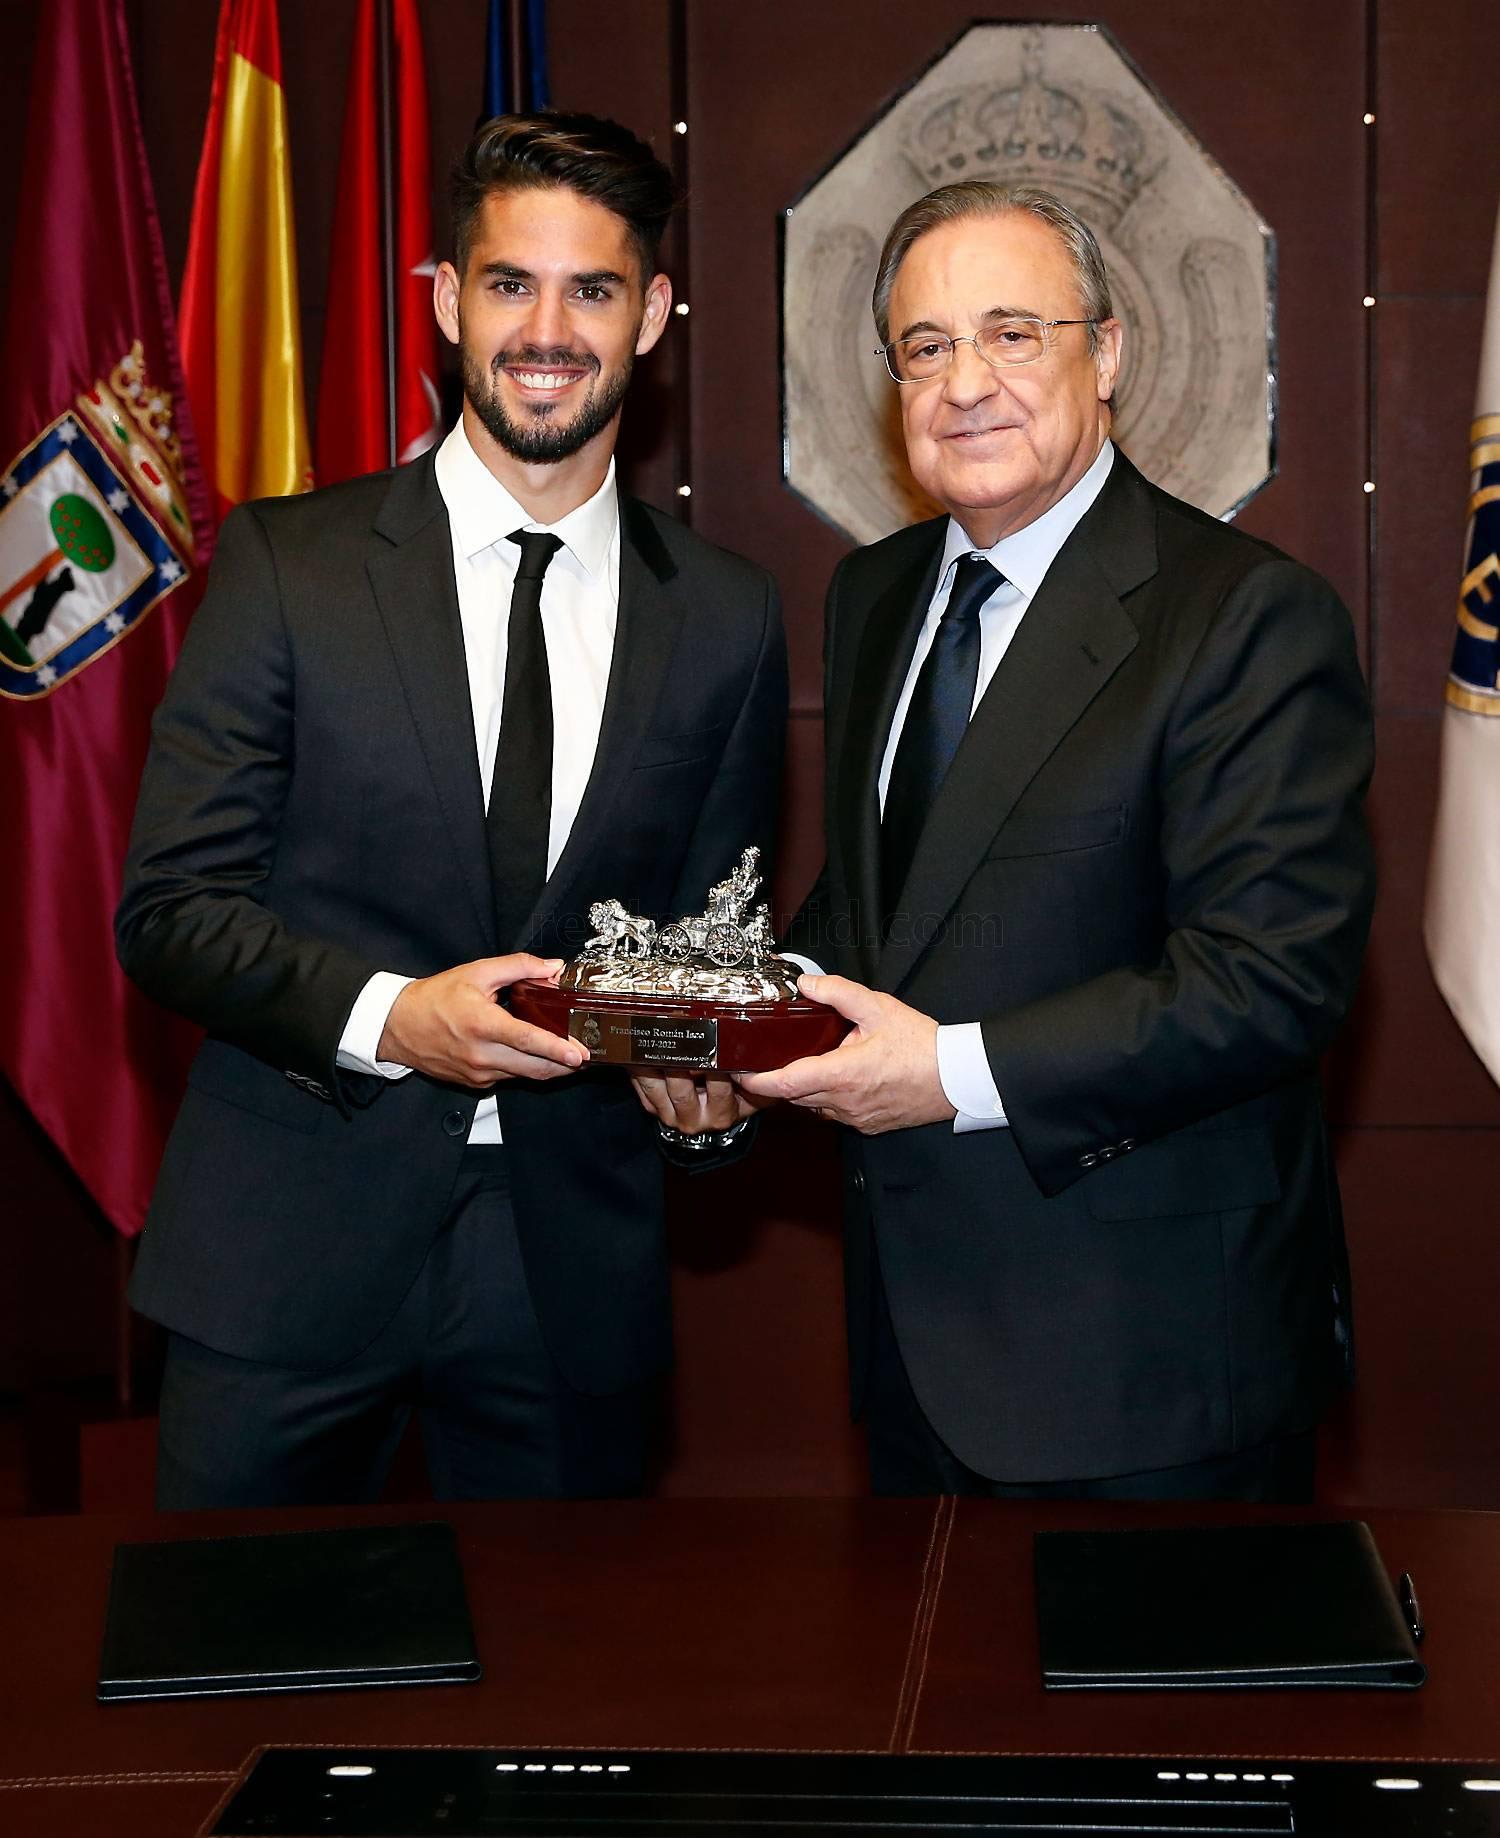 ¿Cuánto mide Florentino Pérez? - Altura - Real height _1rm4031